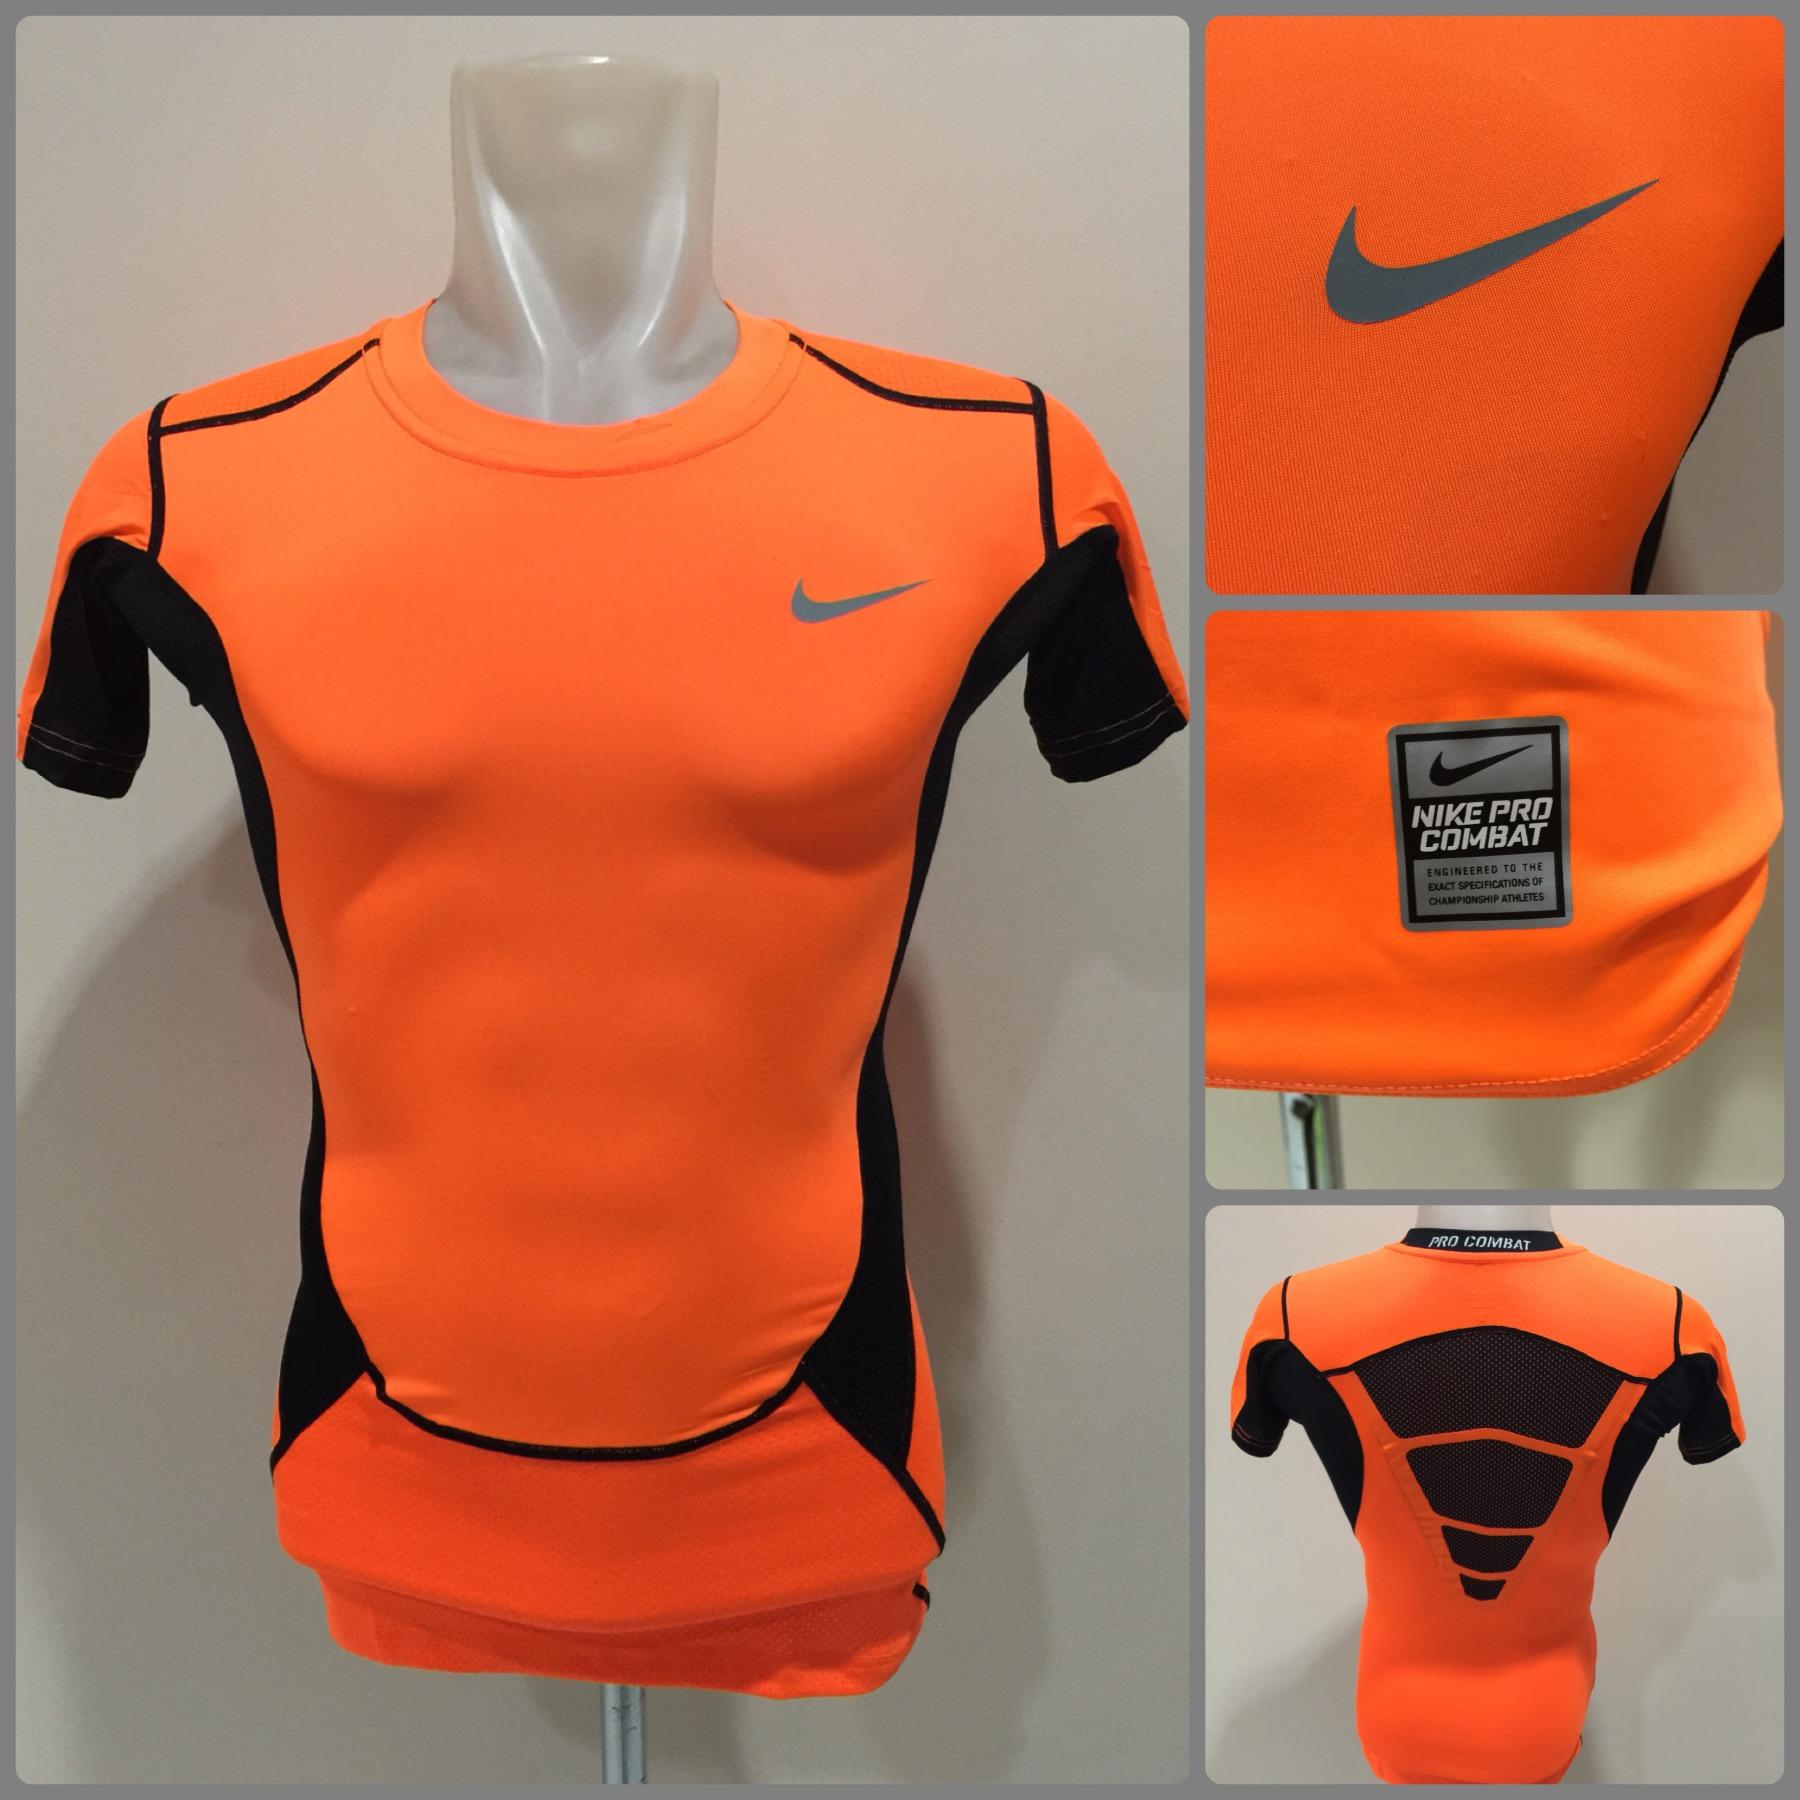 Kaos Baselayer Nike Pro Combat Vapor Short Sleeve Orange Black